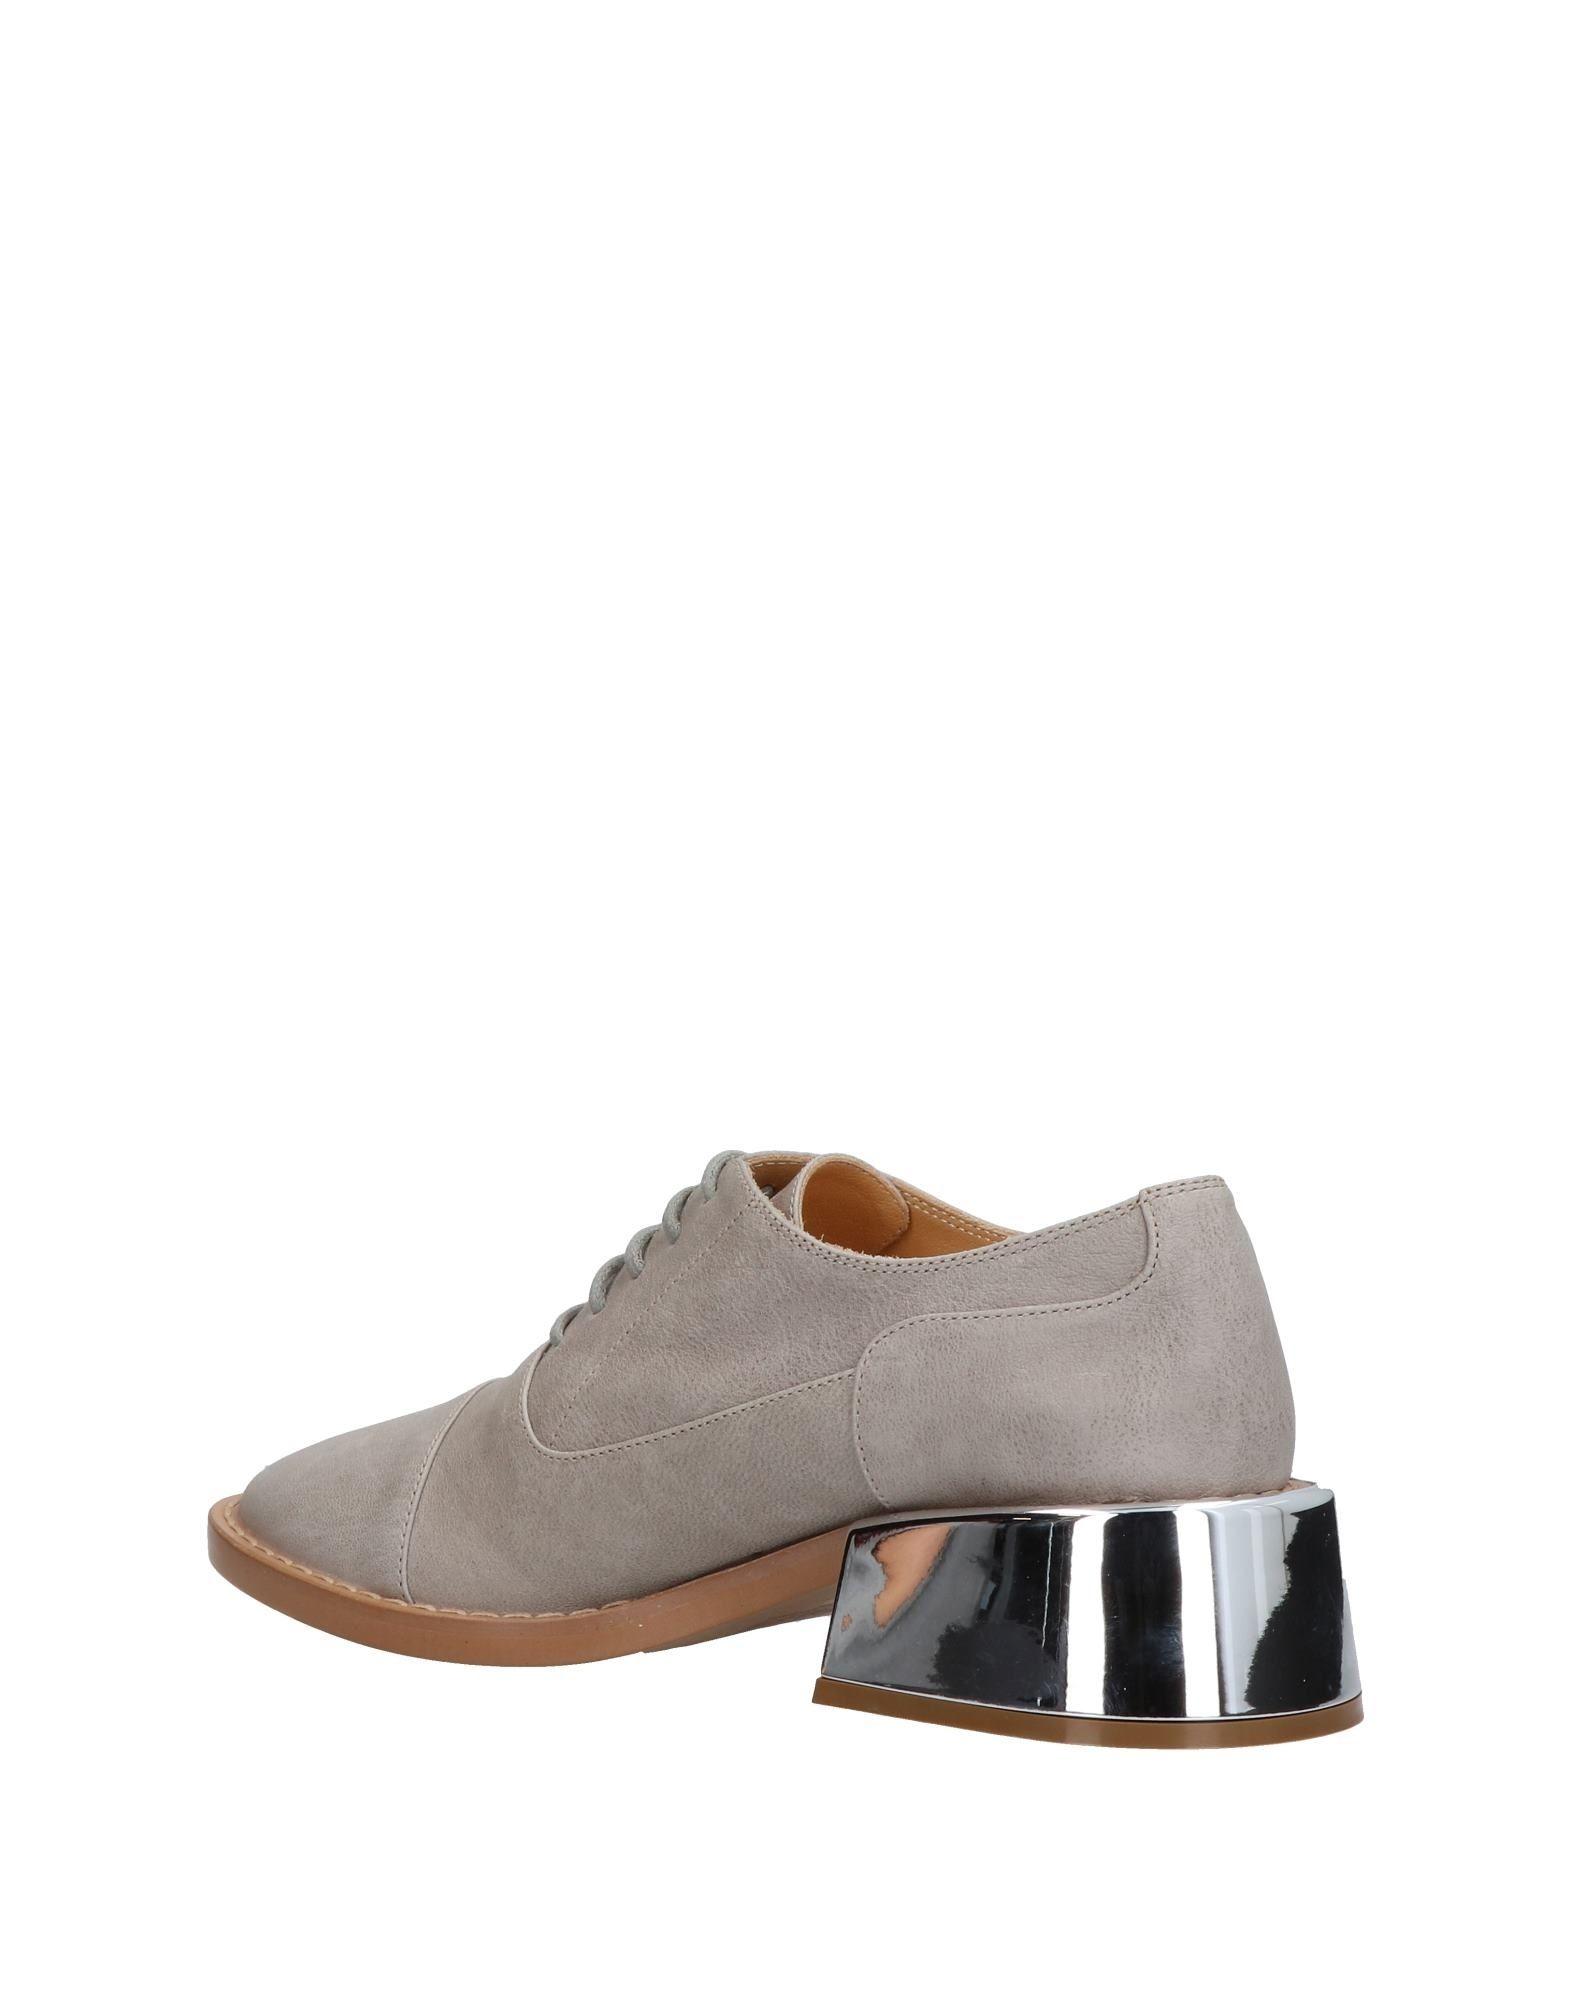 Chaussures Under Armour SpeedForm Apollo vertes homme Chaussures Under Armour grises homme MM6 MAISON MARGIELA Chaussures à lacets femme. OKQSDMUw4